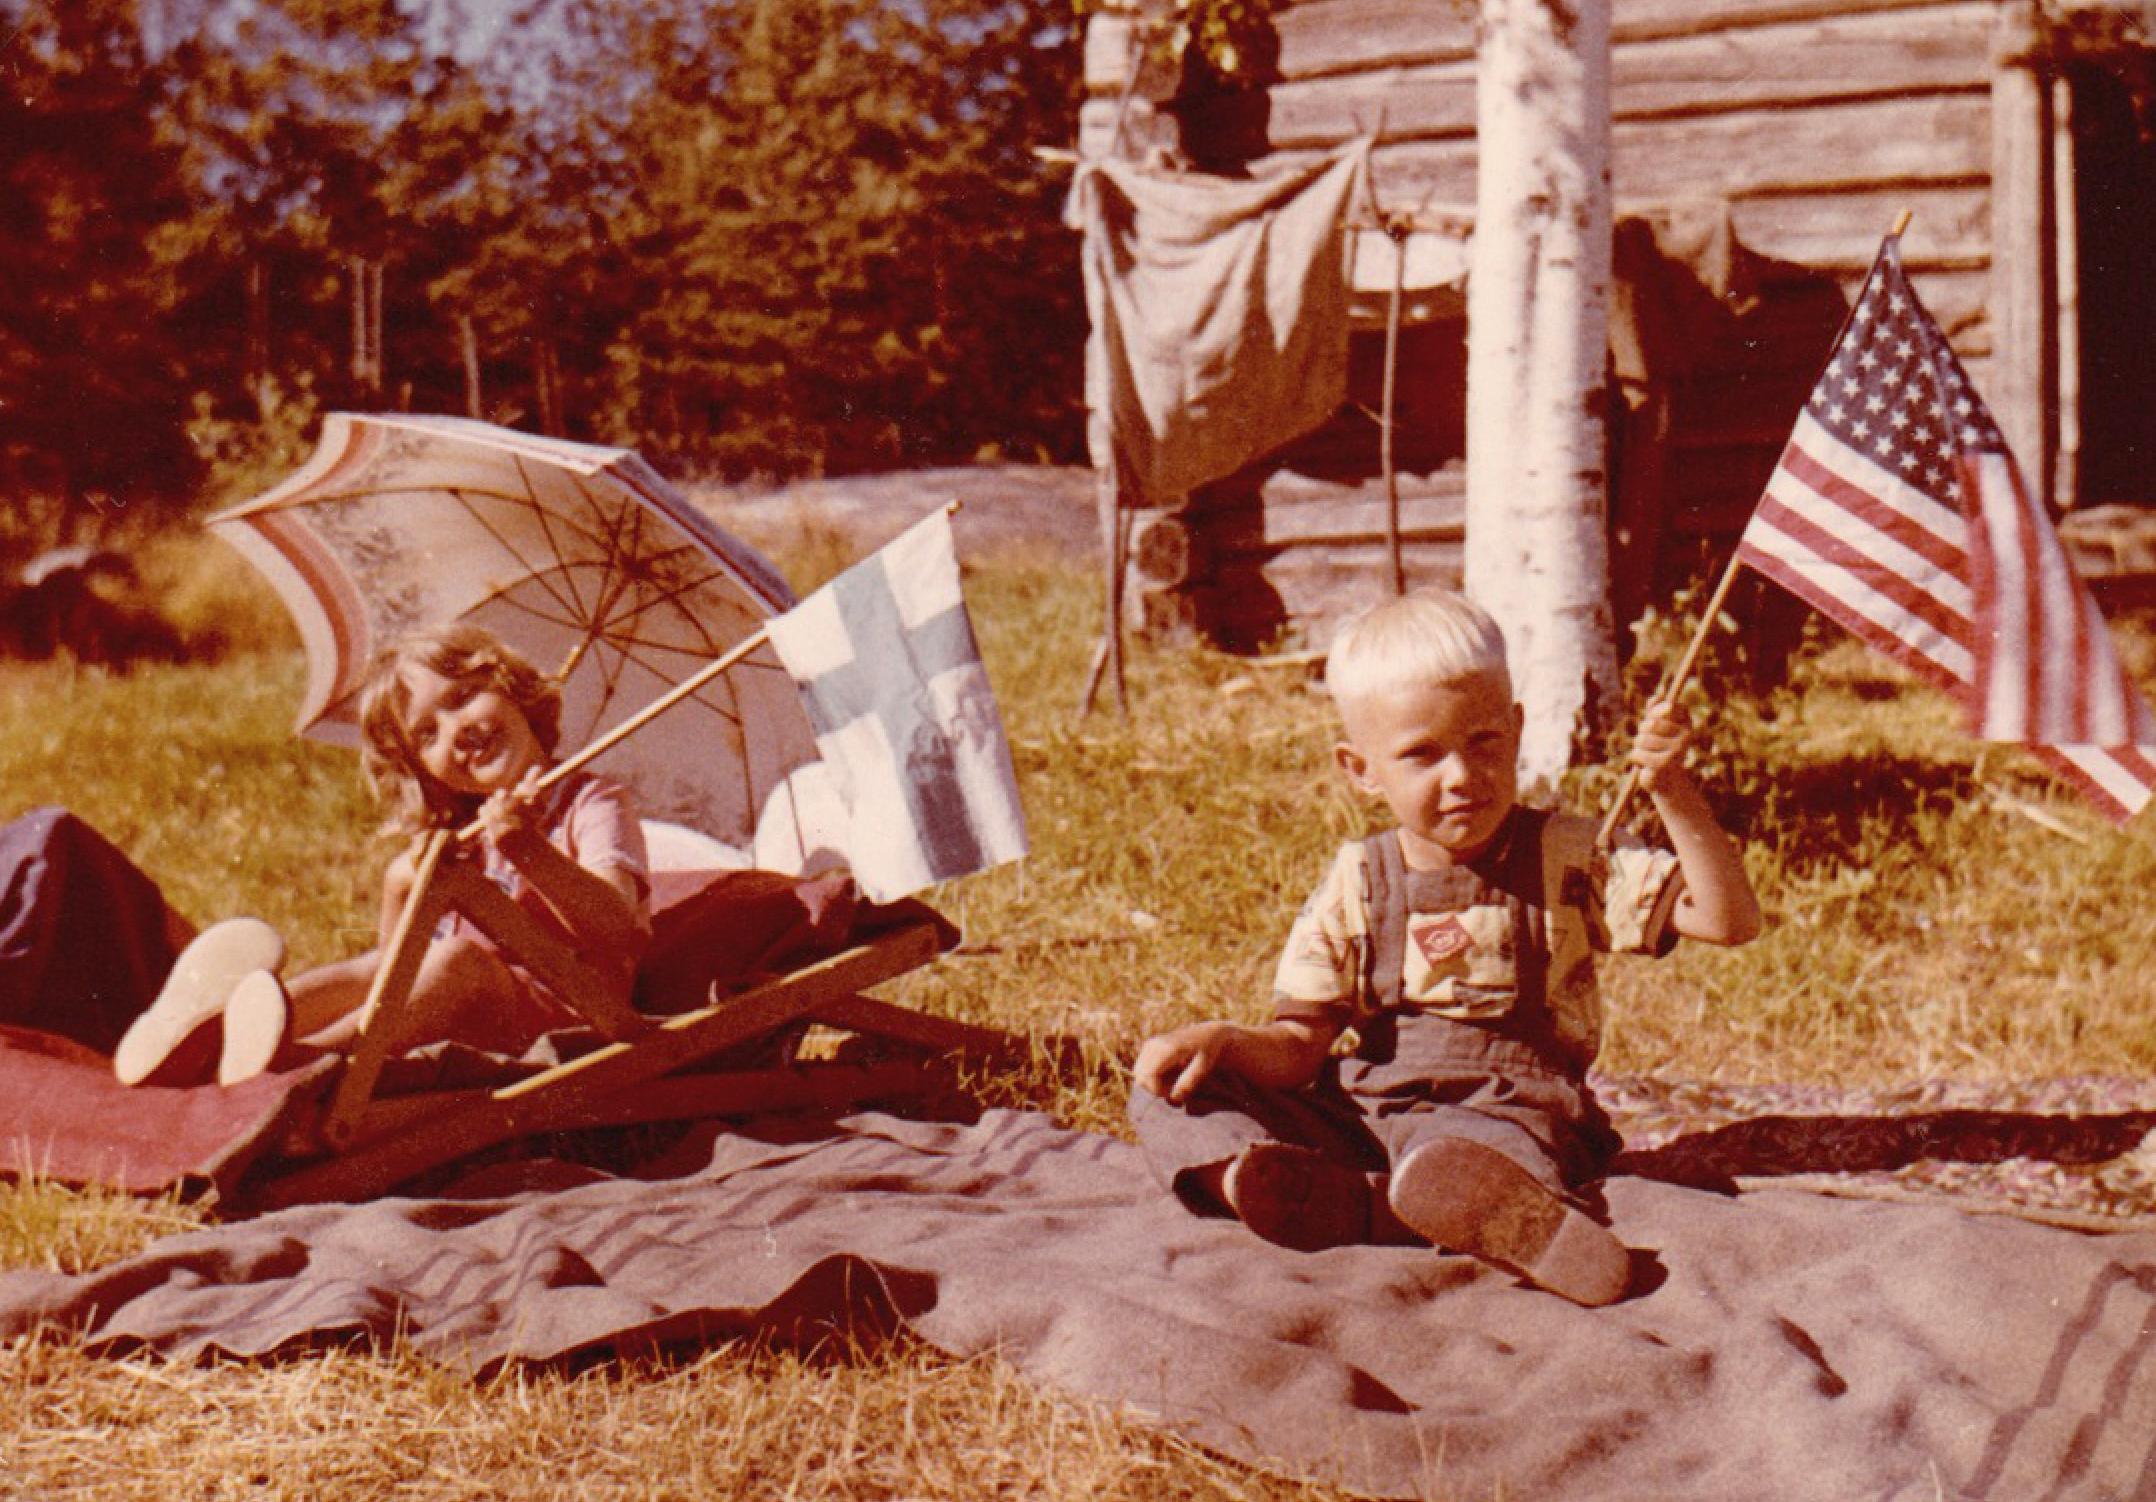 heikki_american-flg-kid.png